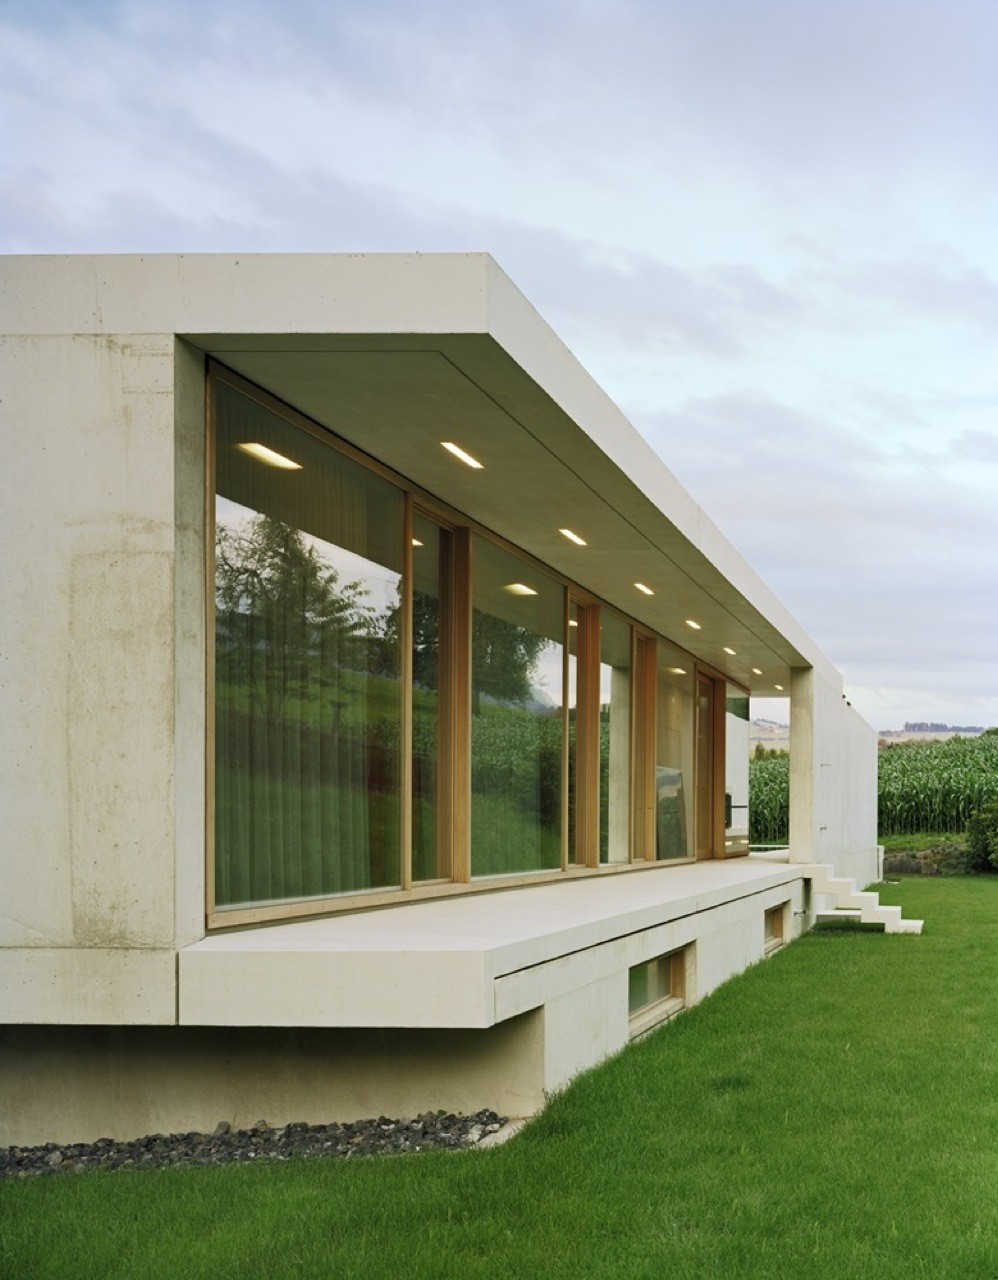 gallery of house at zimmerberg bottom rossetti wyss architekten 15. Black Bedroom Furniture Sets. Home Design Ideas